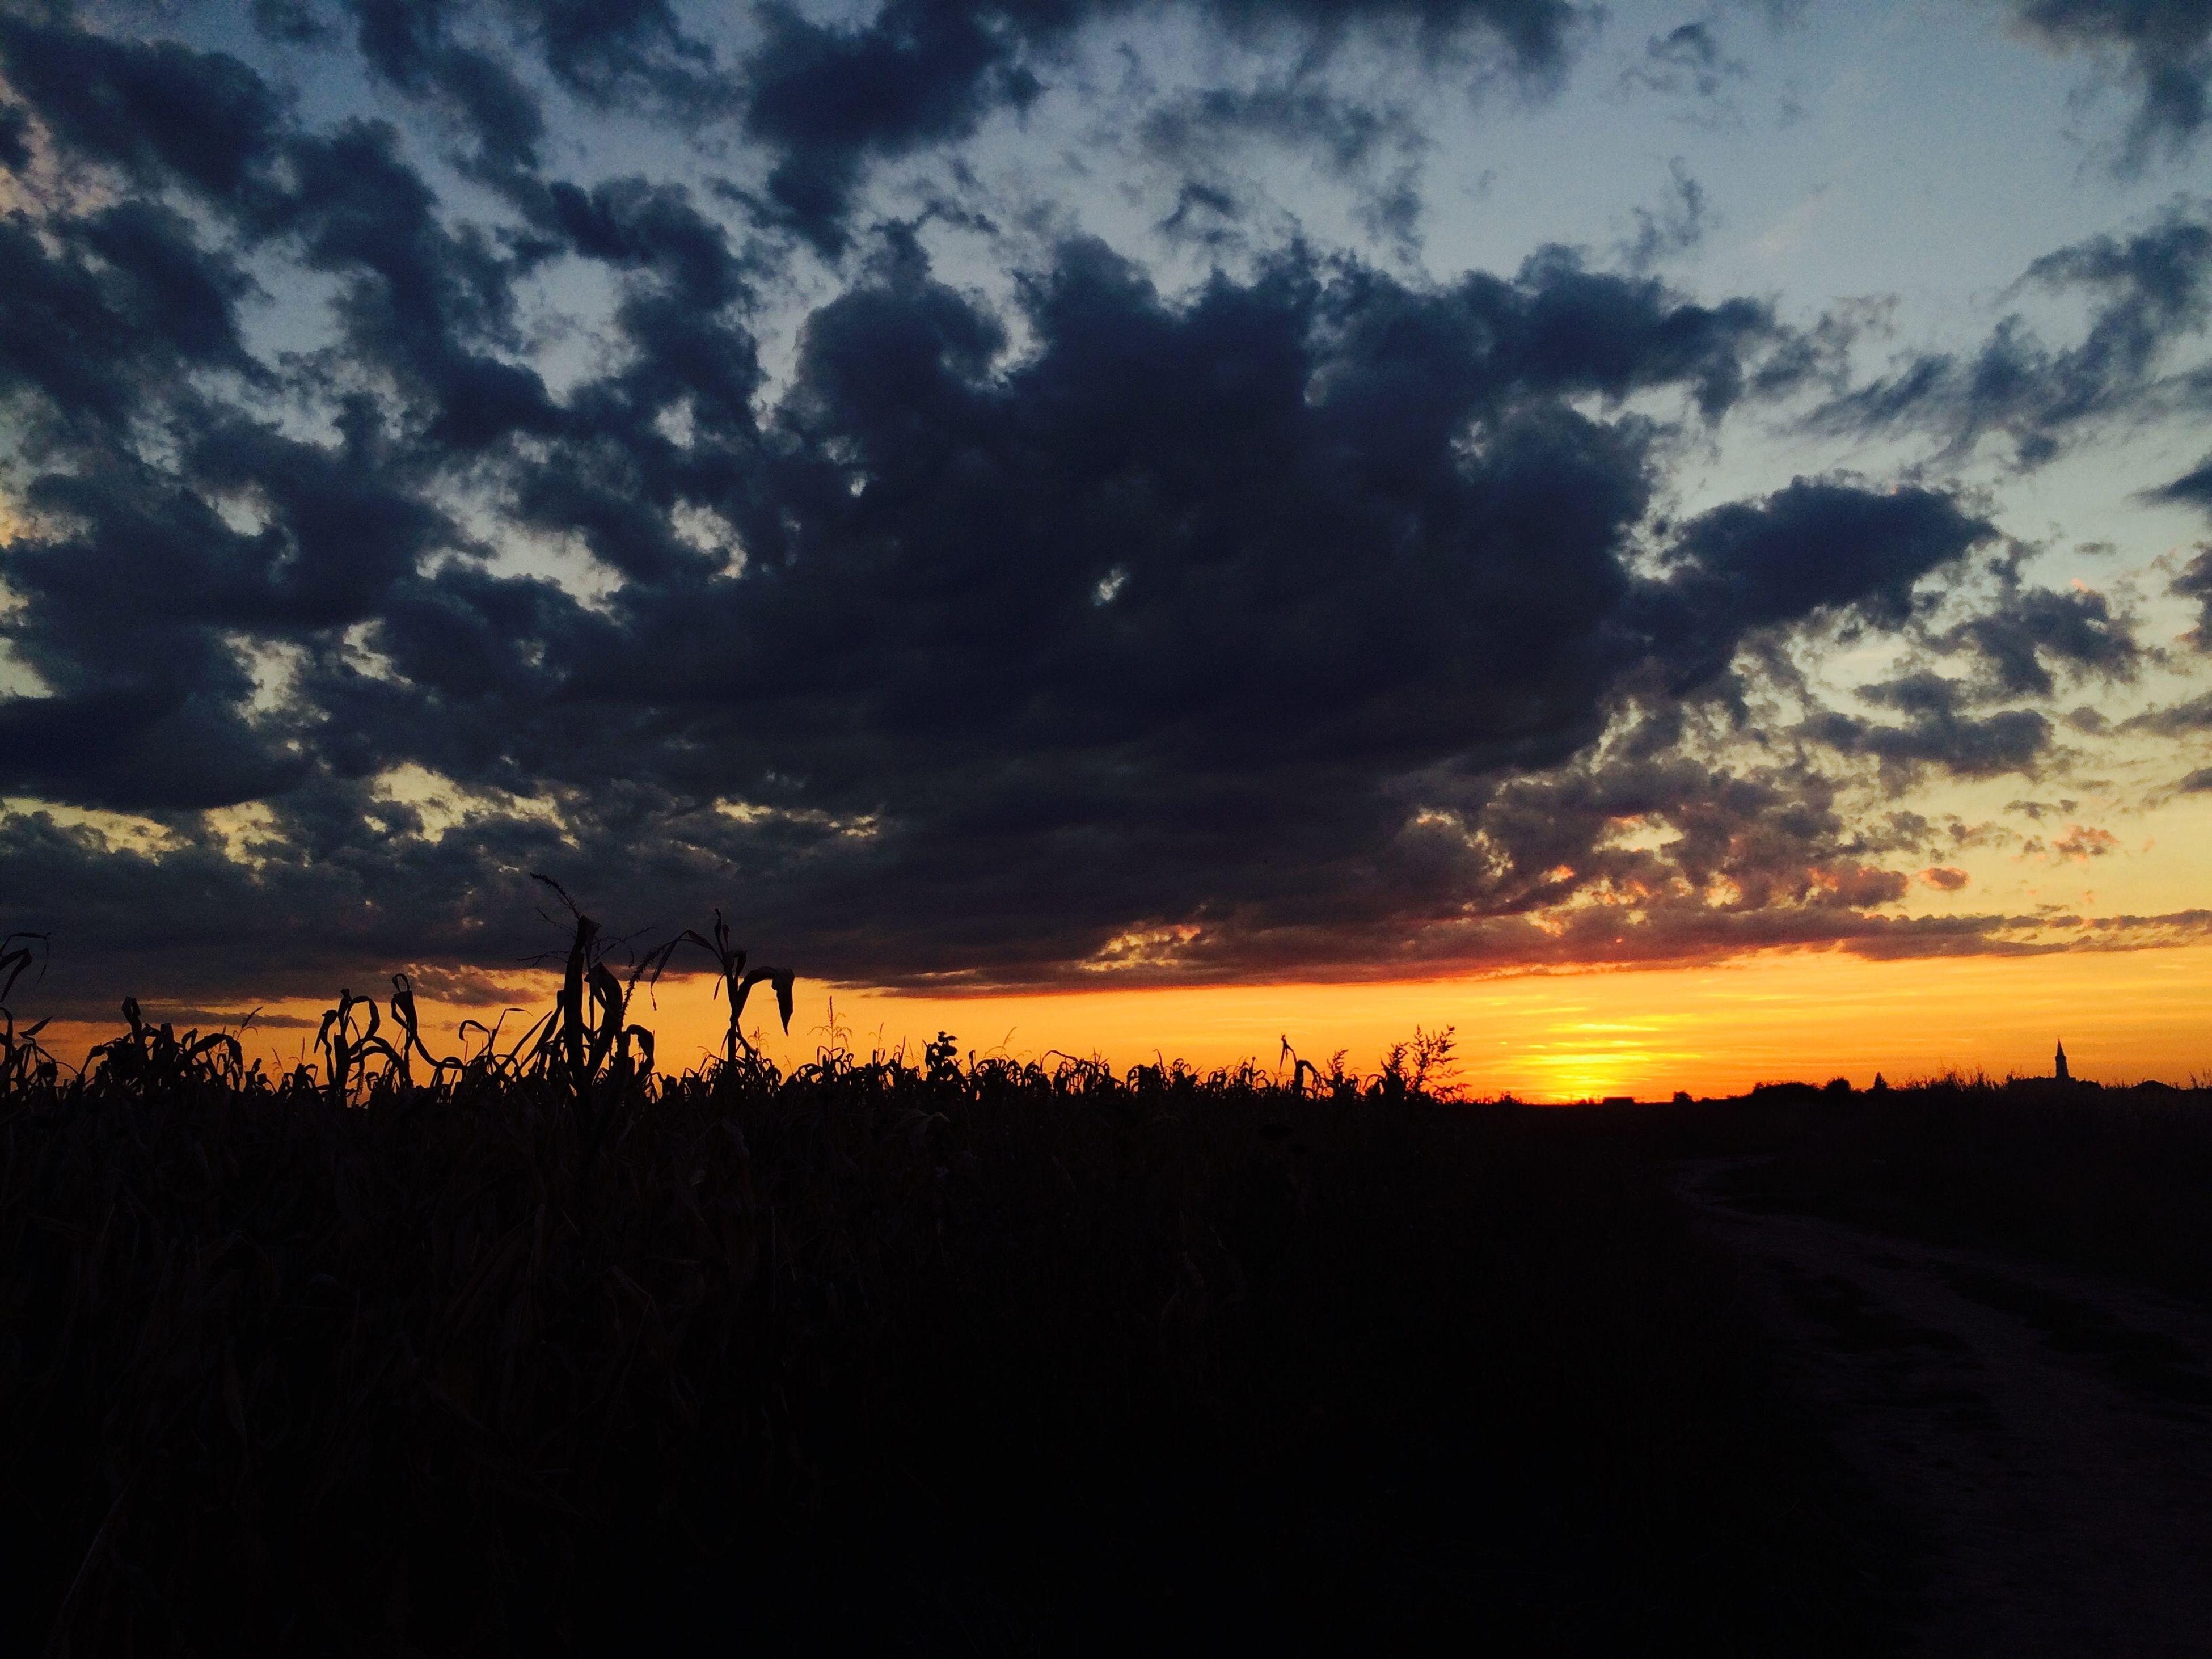 sunset, sky, silhouette, tranquil scene, tranquility, landscape, scenics, beauty in nature, field, cloud - sky, nature, orange color, cloud, idyllic, horizon over land, dramatic sky, rural scene, cloudy, outdoors, non-urban scene